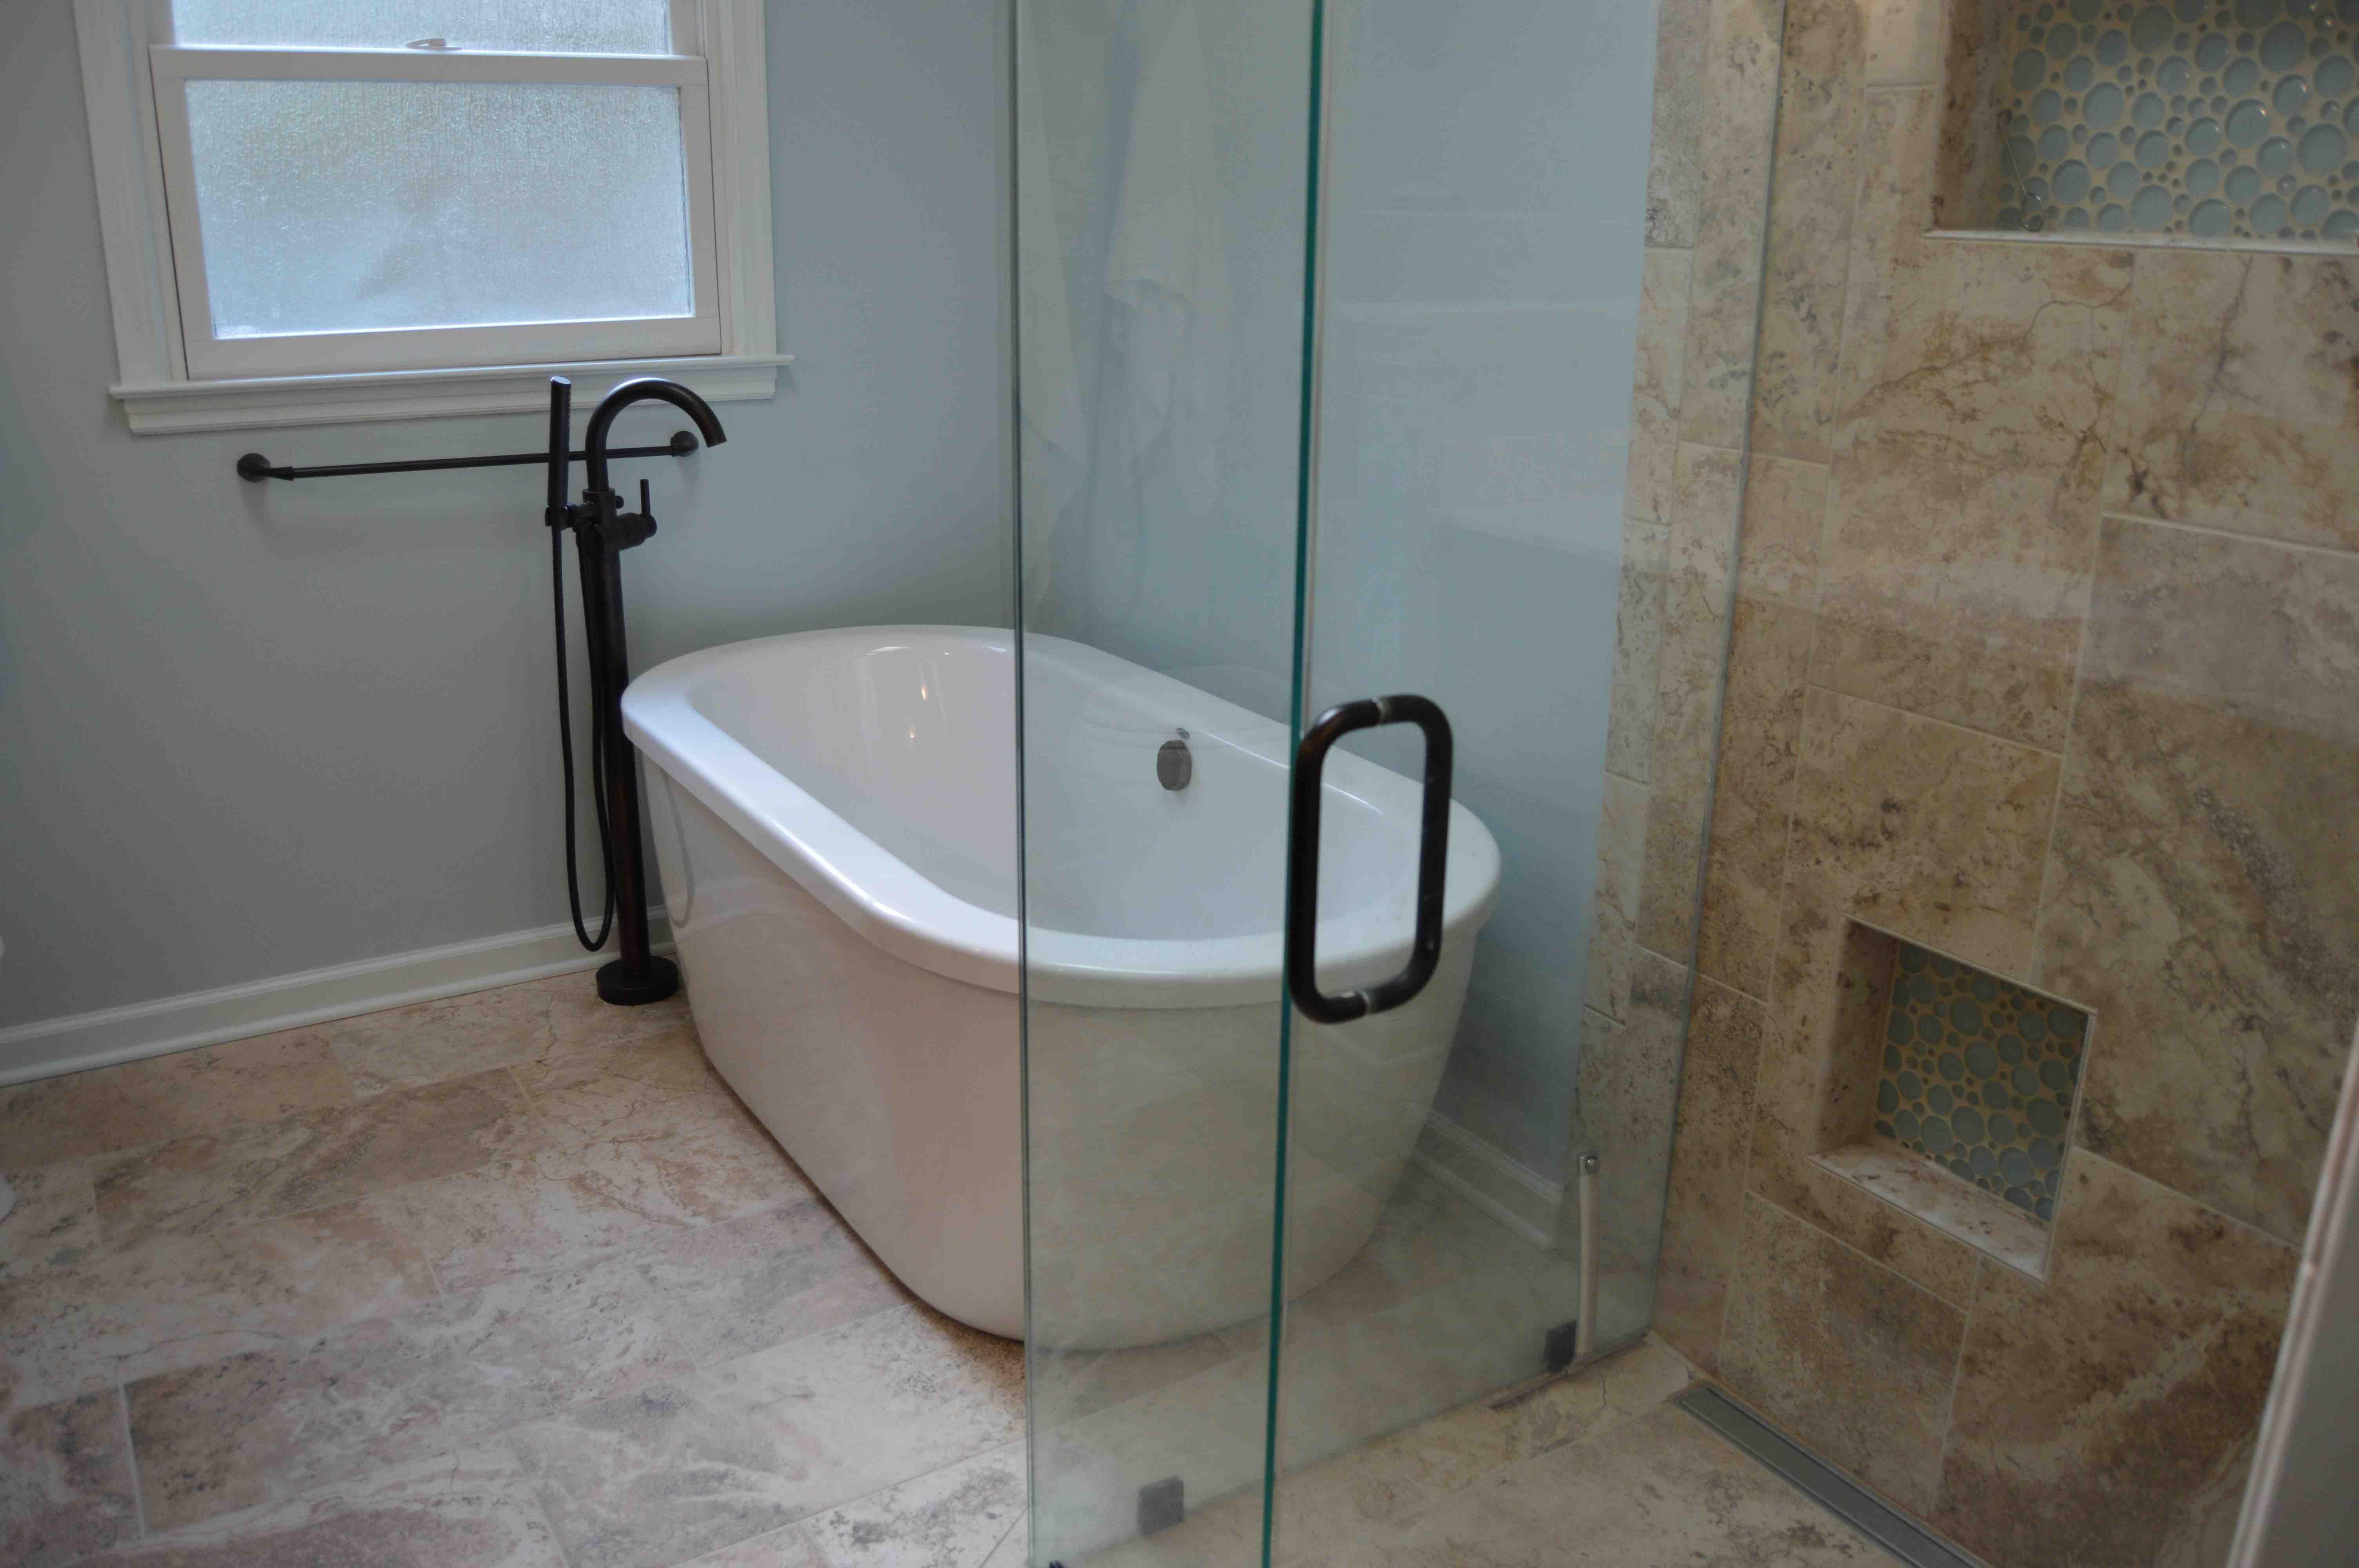 PraterBathroomTubDesignRemodelHatchettVirginia Beach - Hatchett bathroom remodel